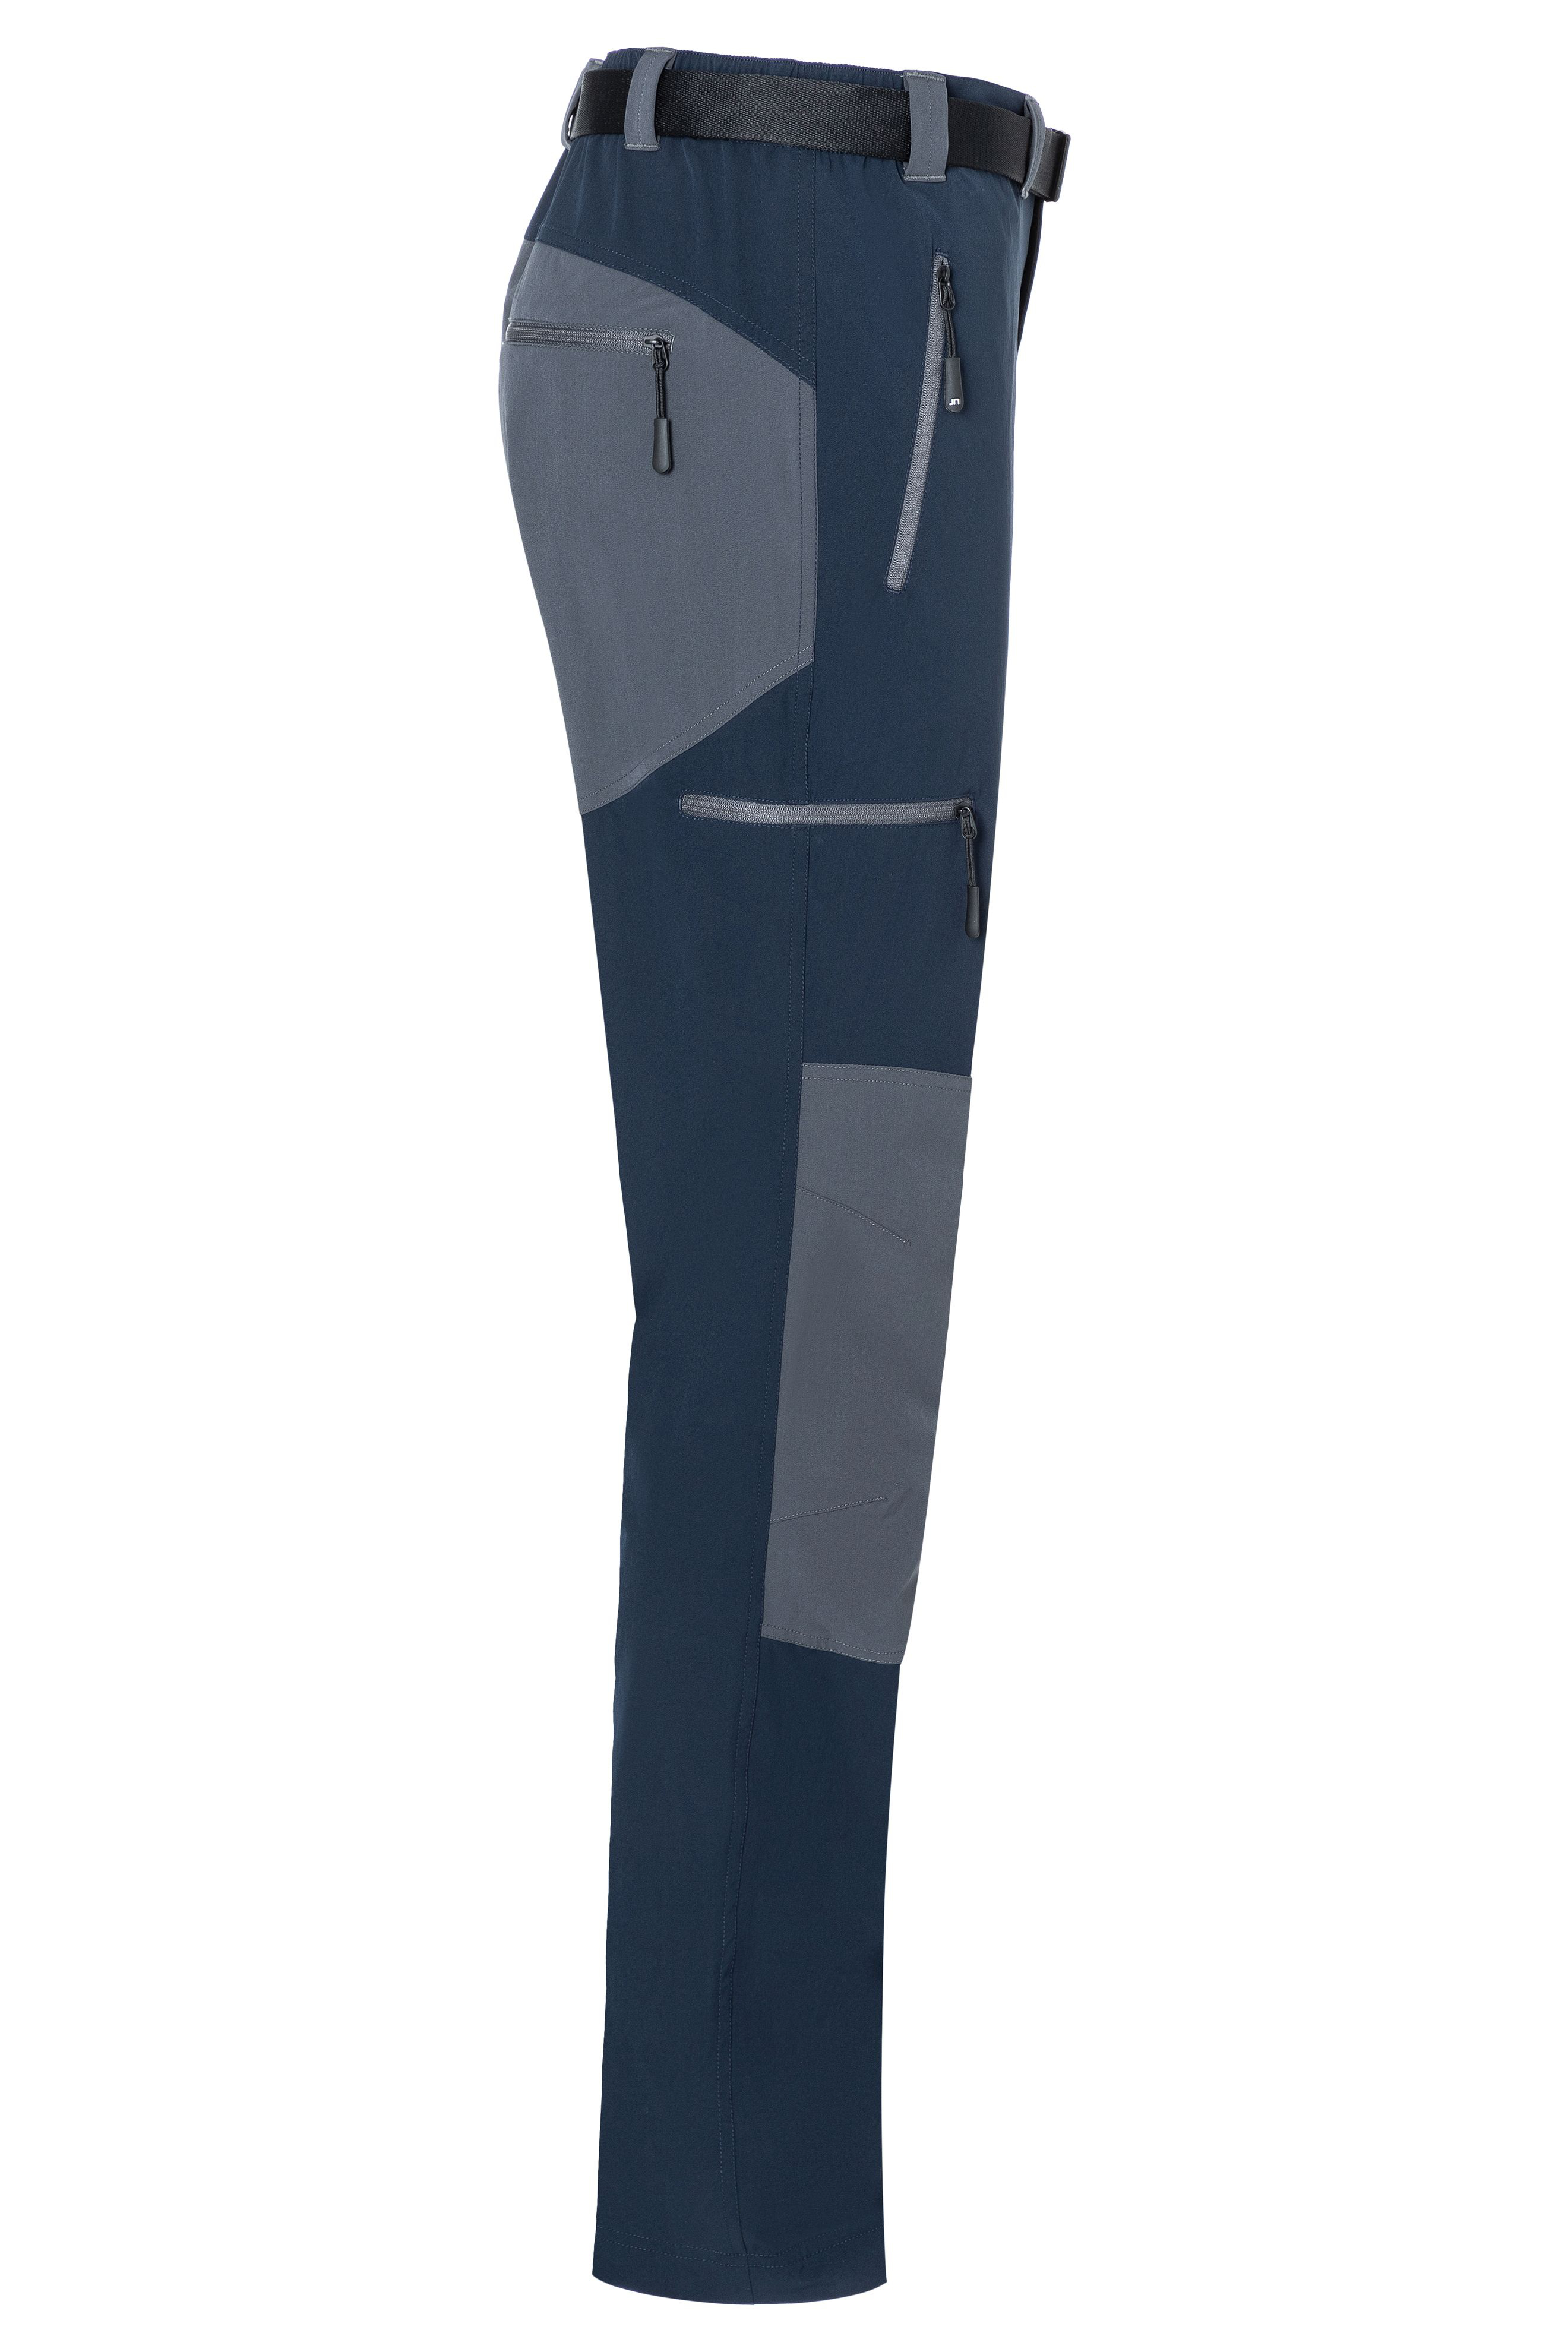 Segelfliegerhose mit extra langem Reißverschluss